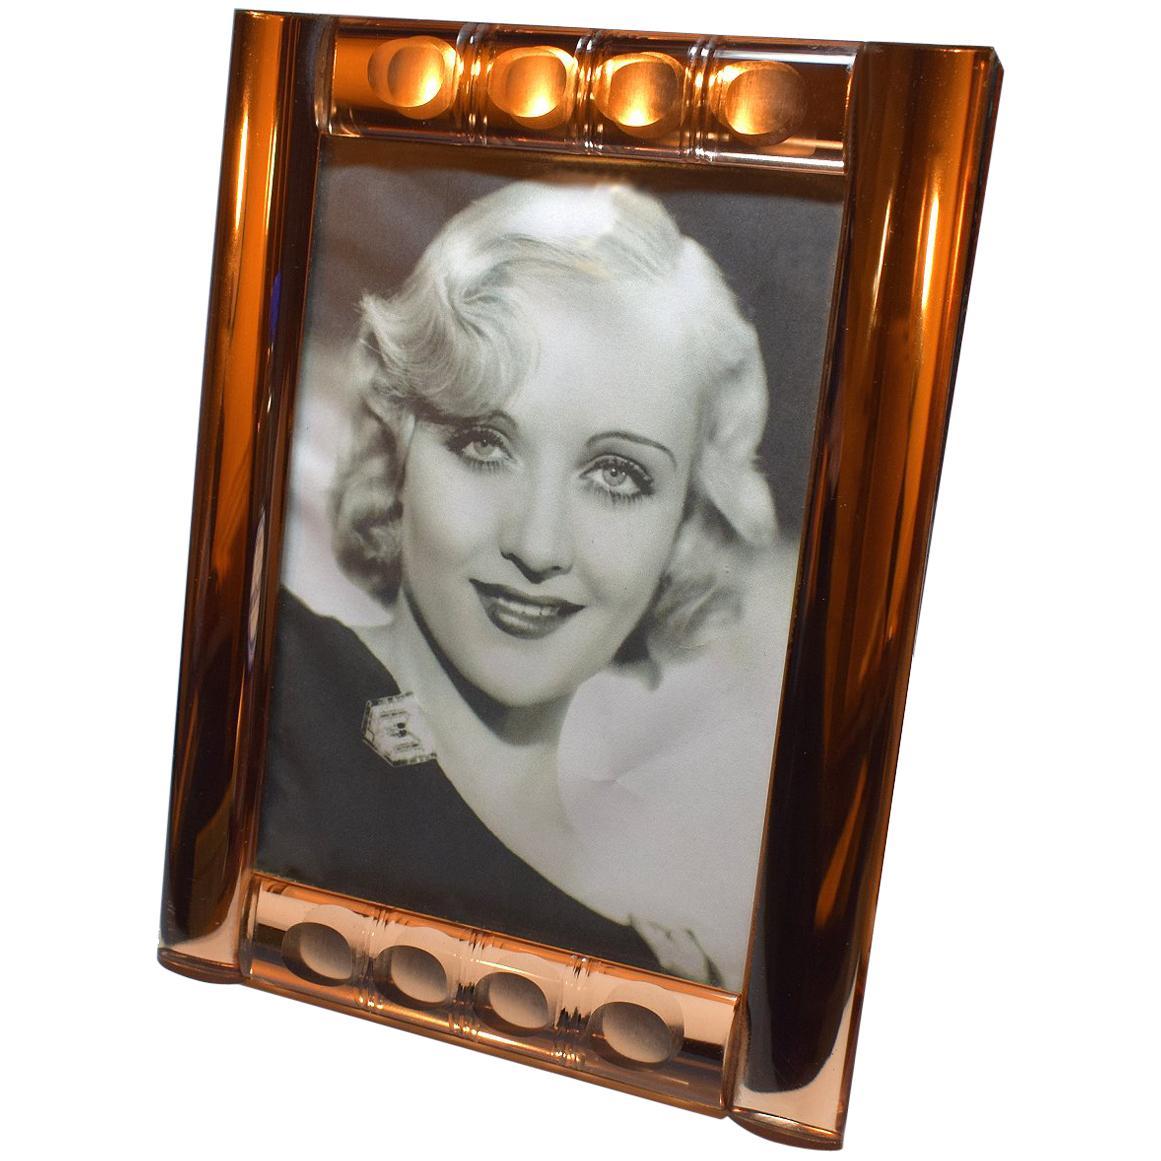 Art Deco Peach Mirrored Bevelled Glass Picture Frame, circa 1930